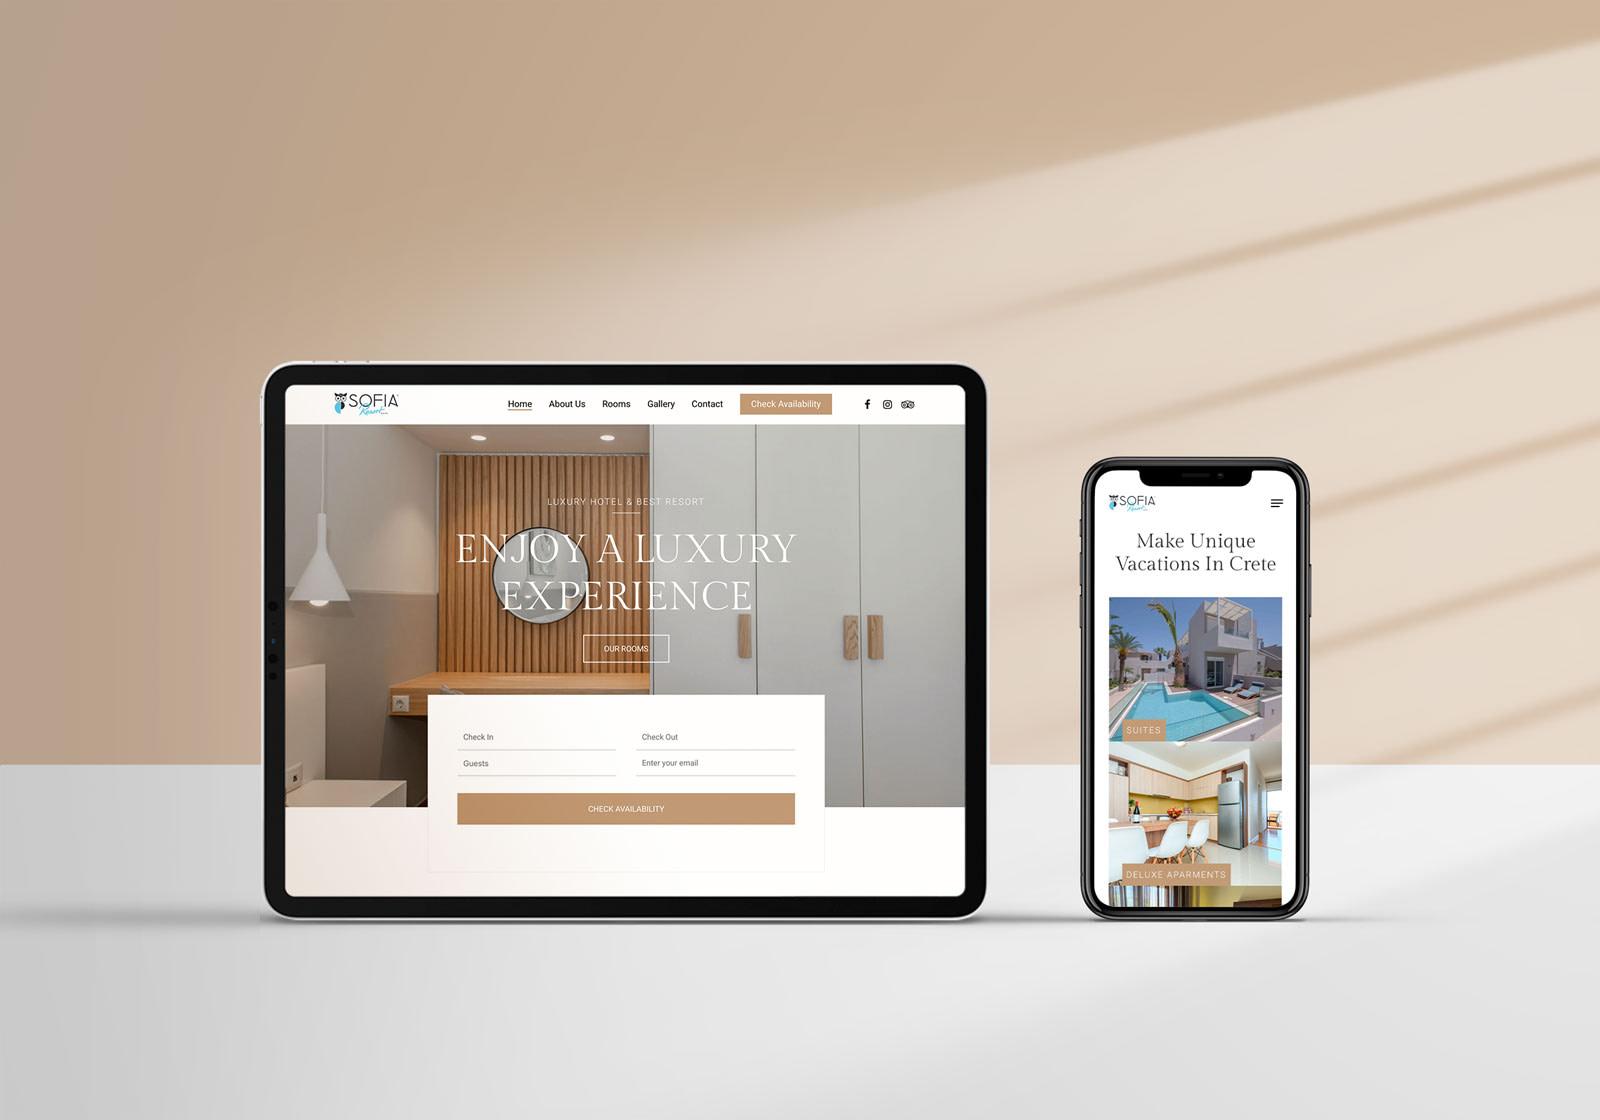 sofia-resort-website